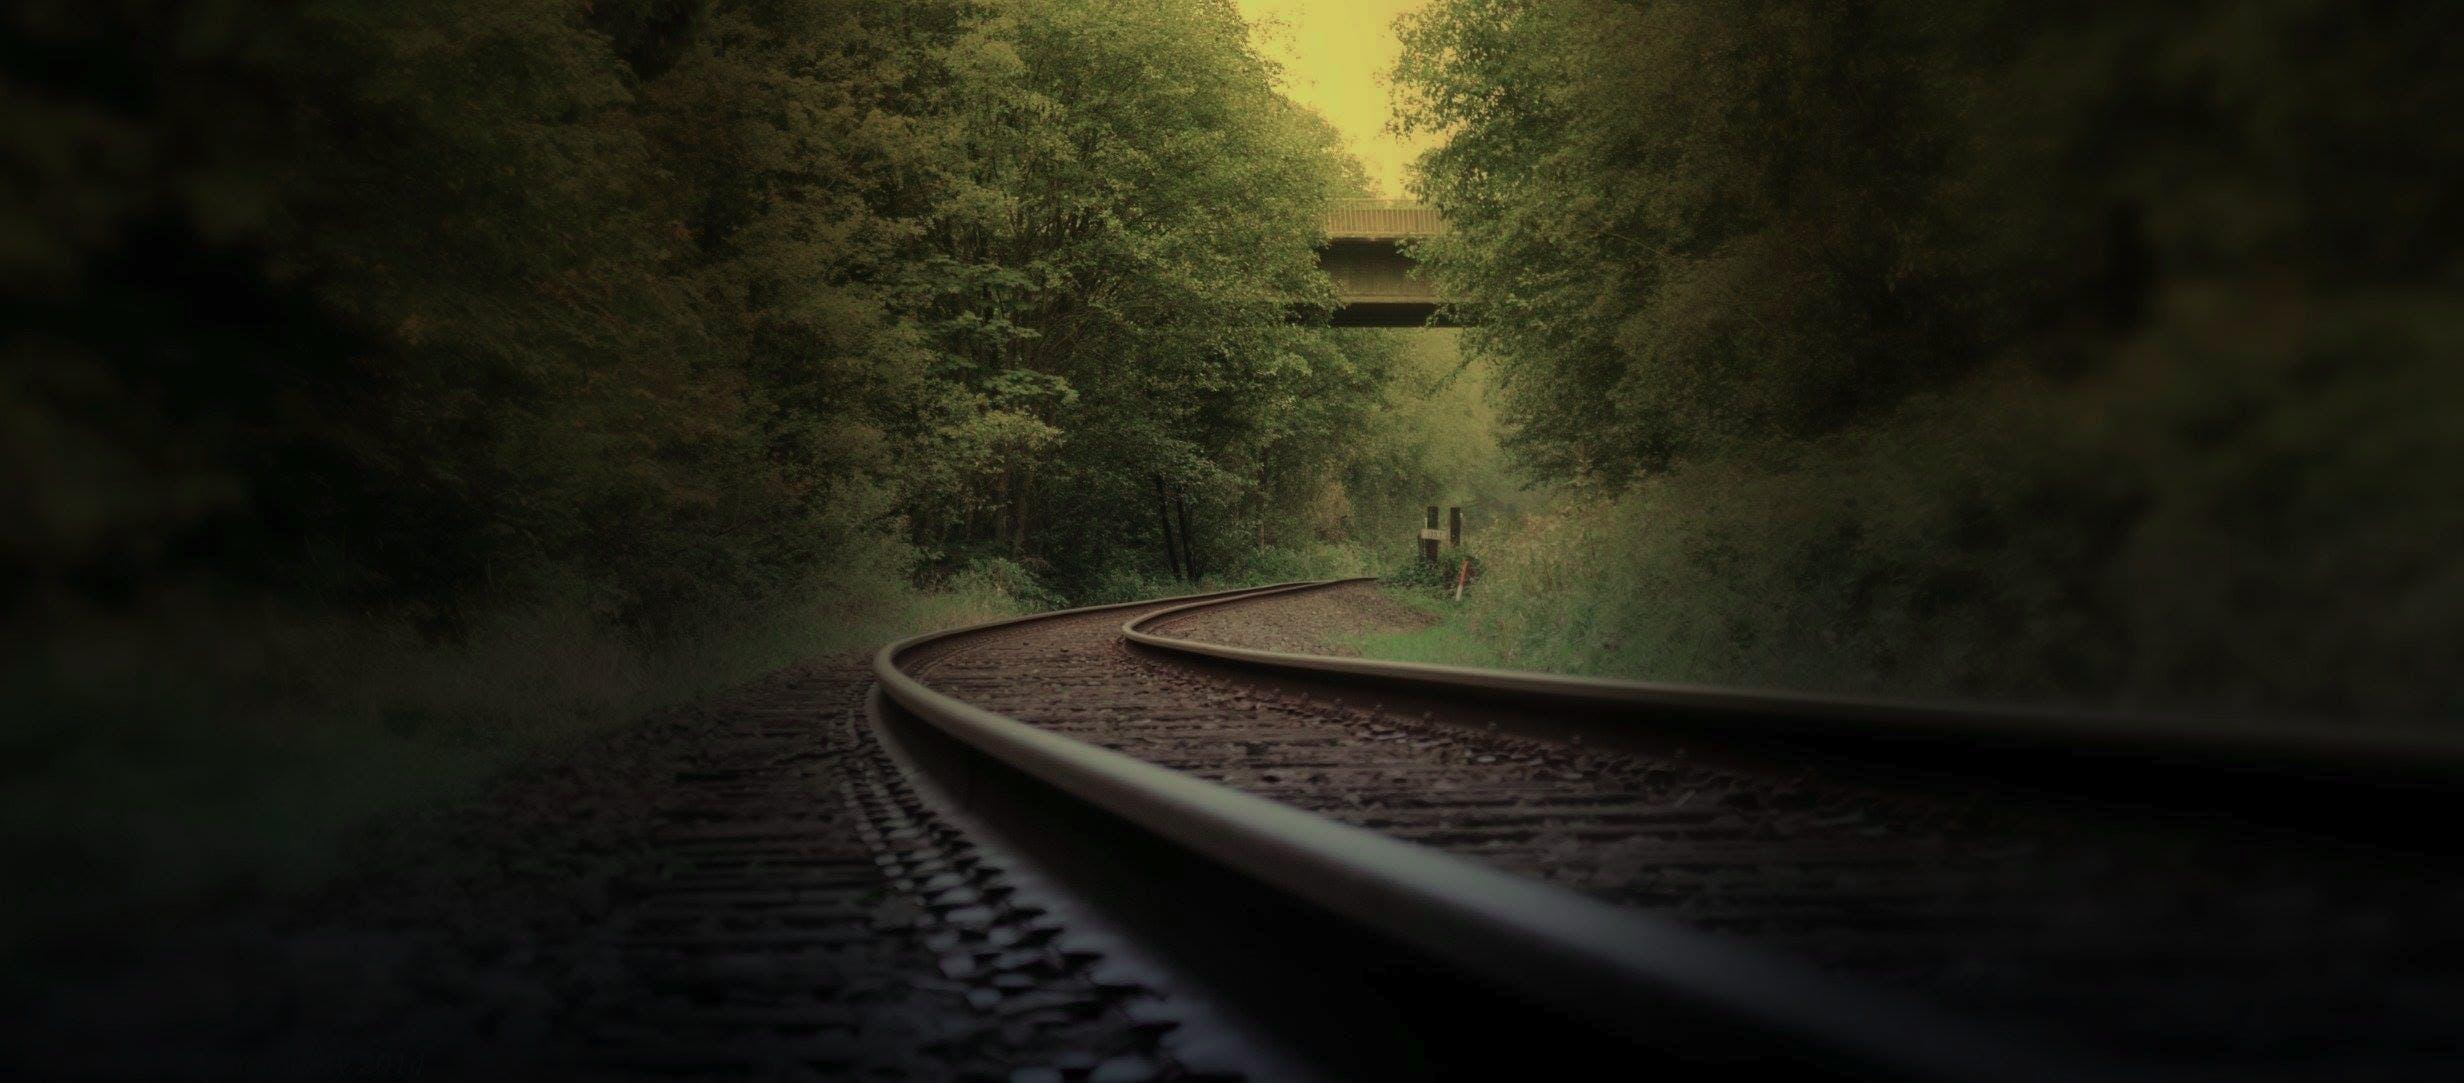 Train Rail Photo during Daytime